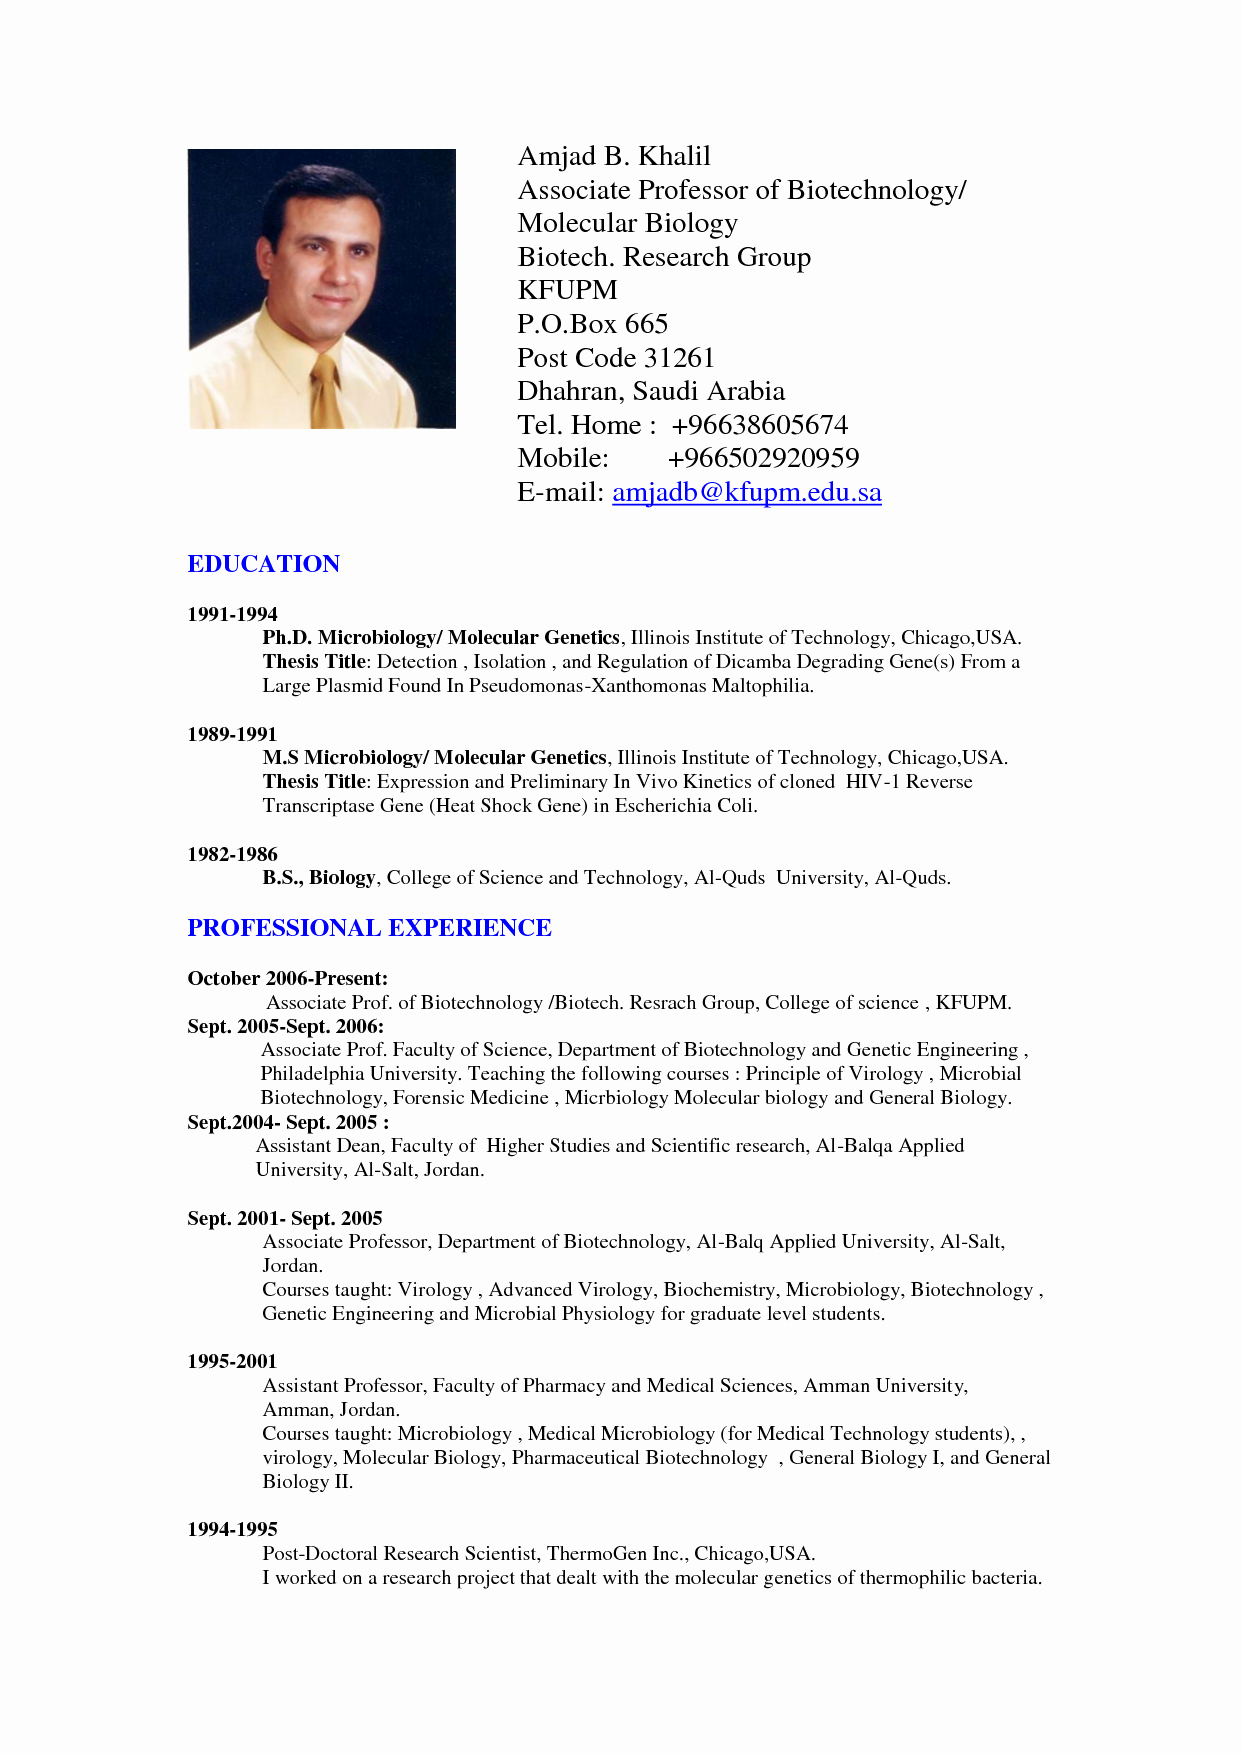 Professional Resume format Doc